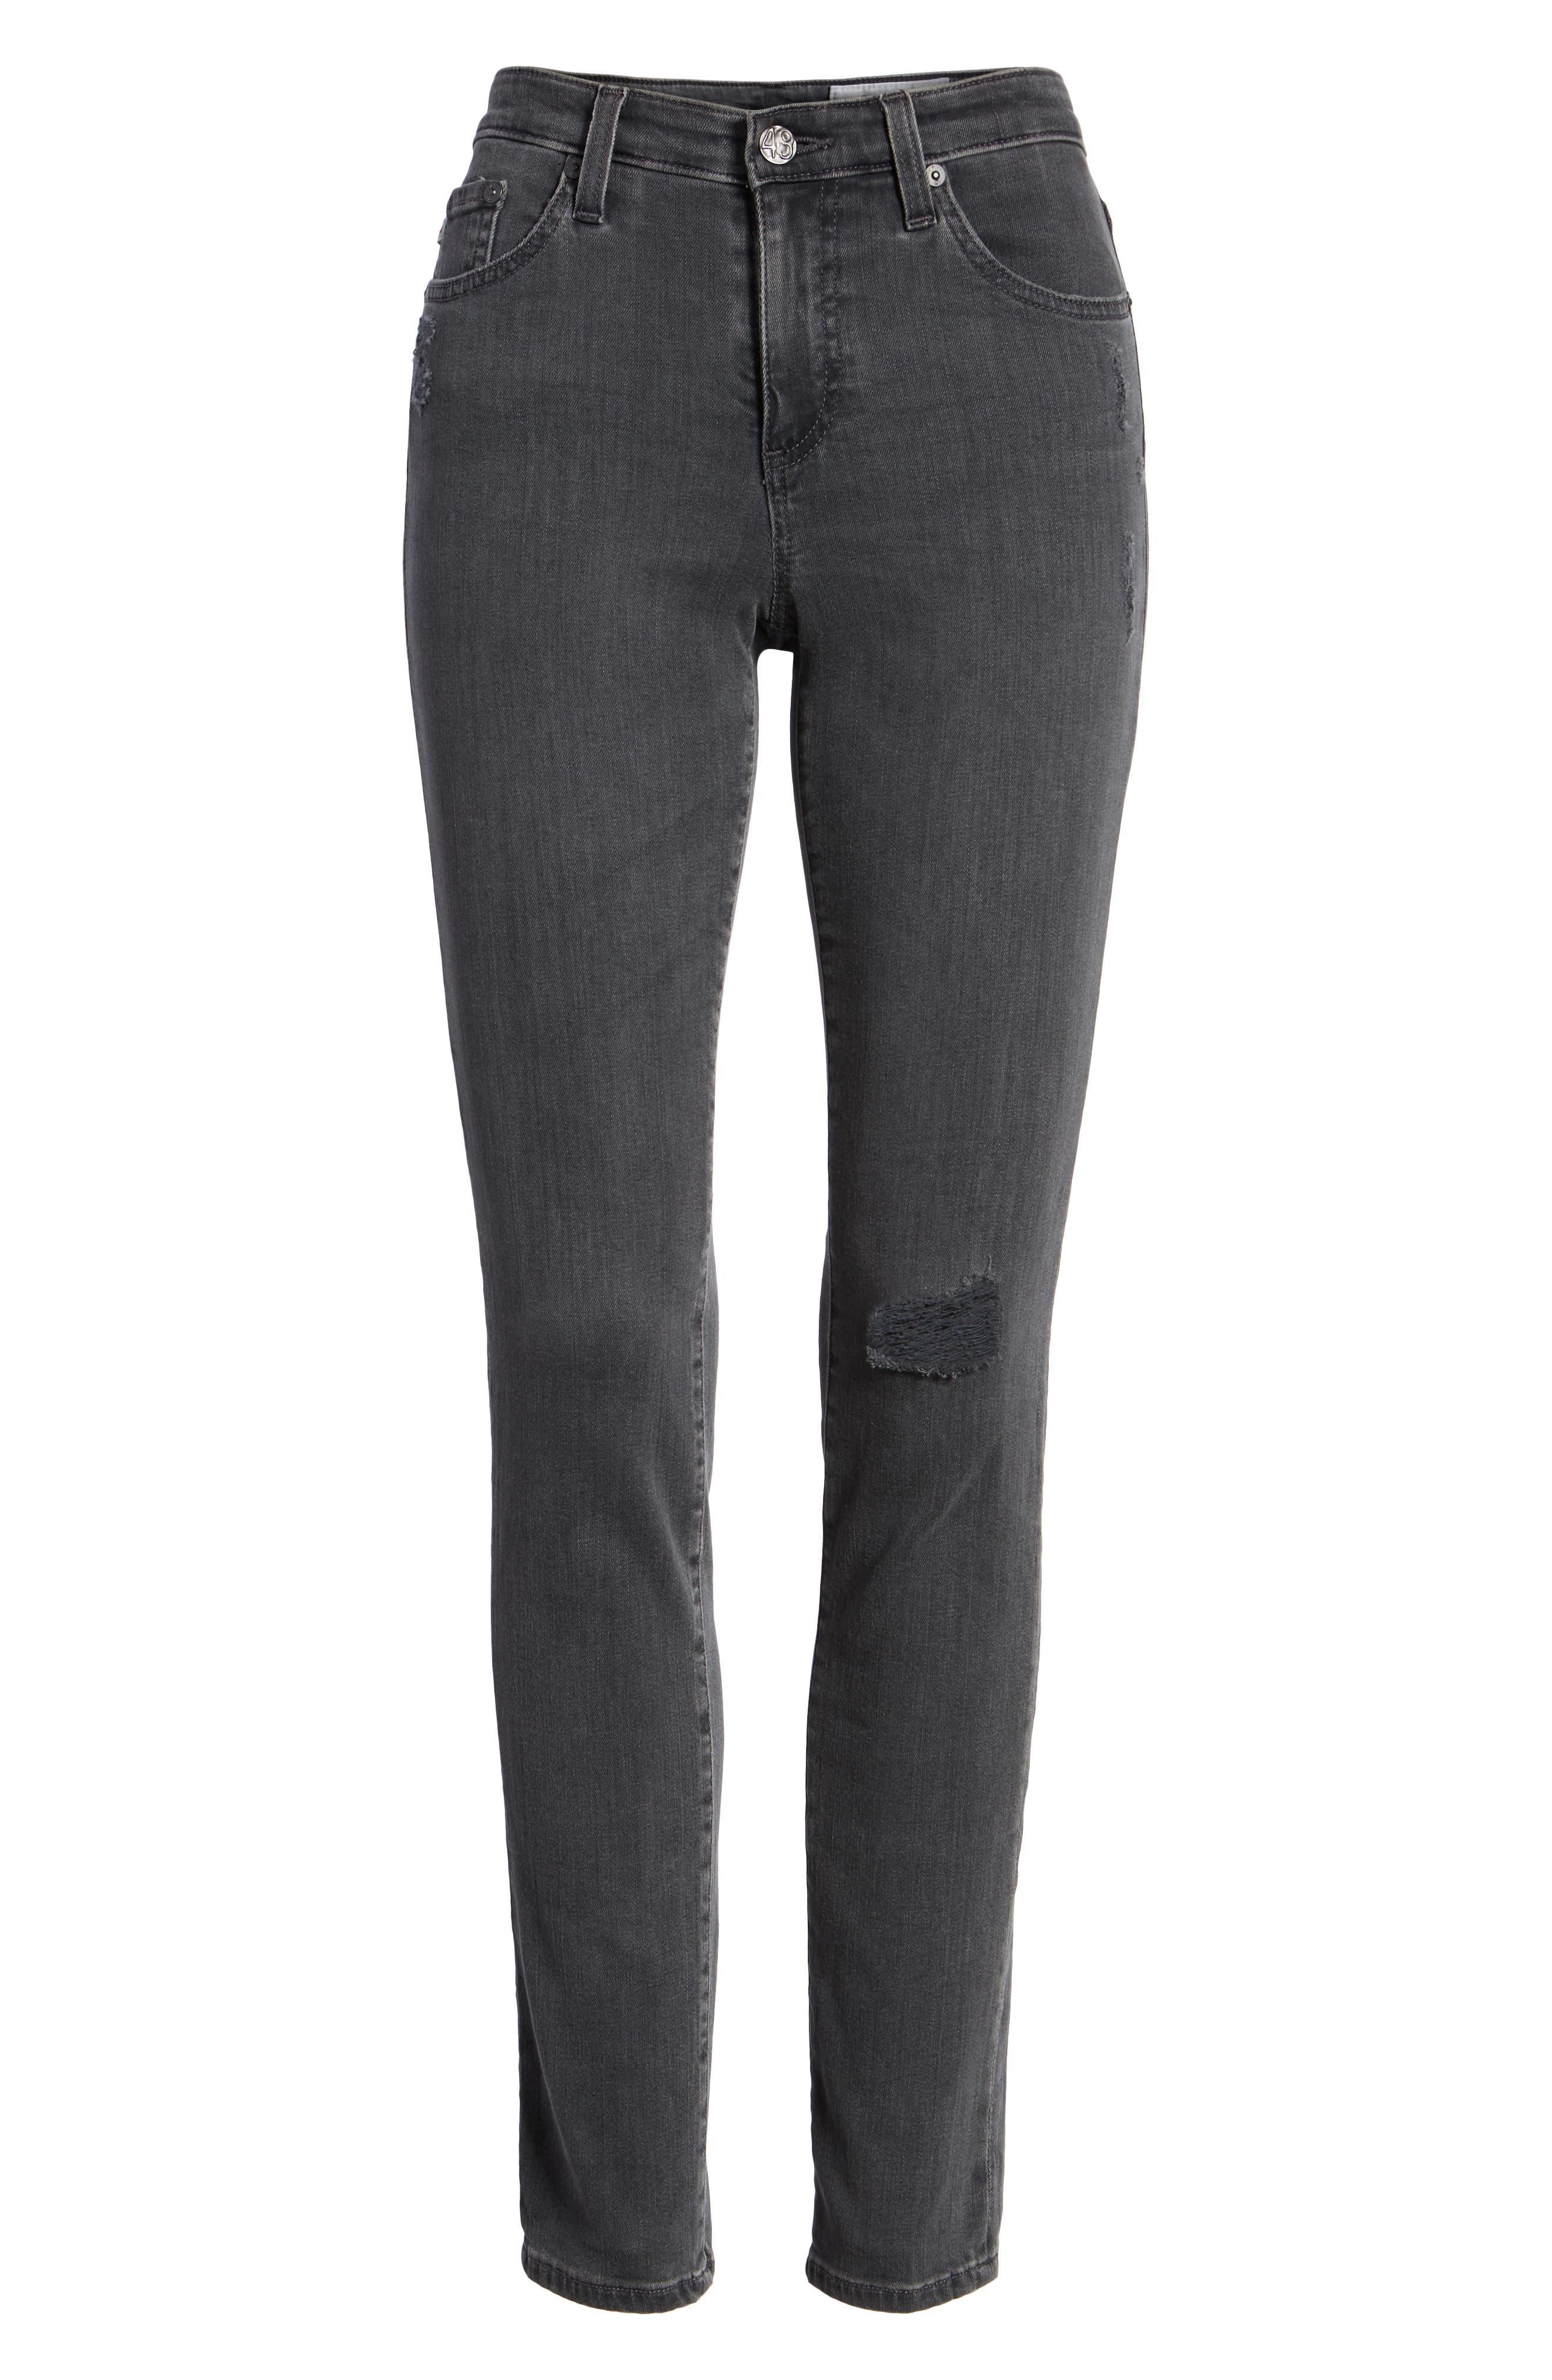 'The Legging' Ankle Super Skinny Jeans,                             Alternate thumbnail 23, color,